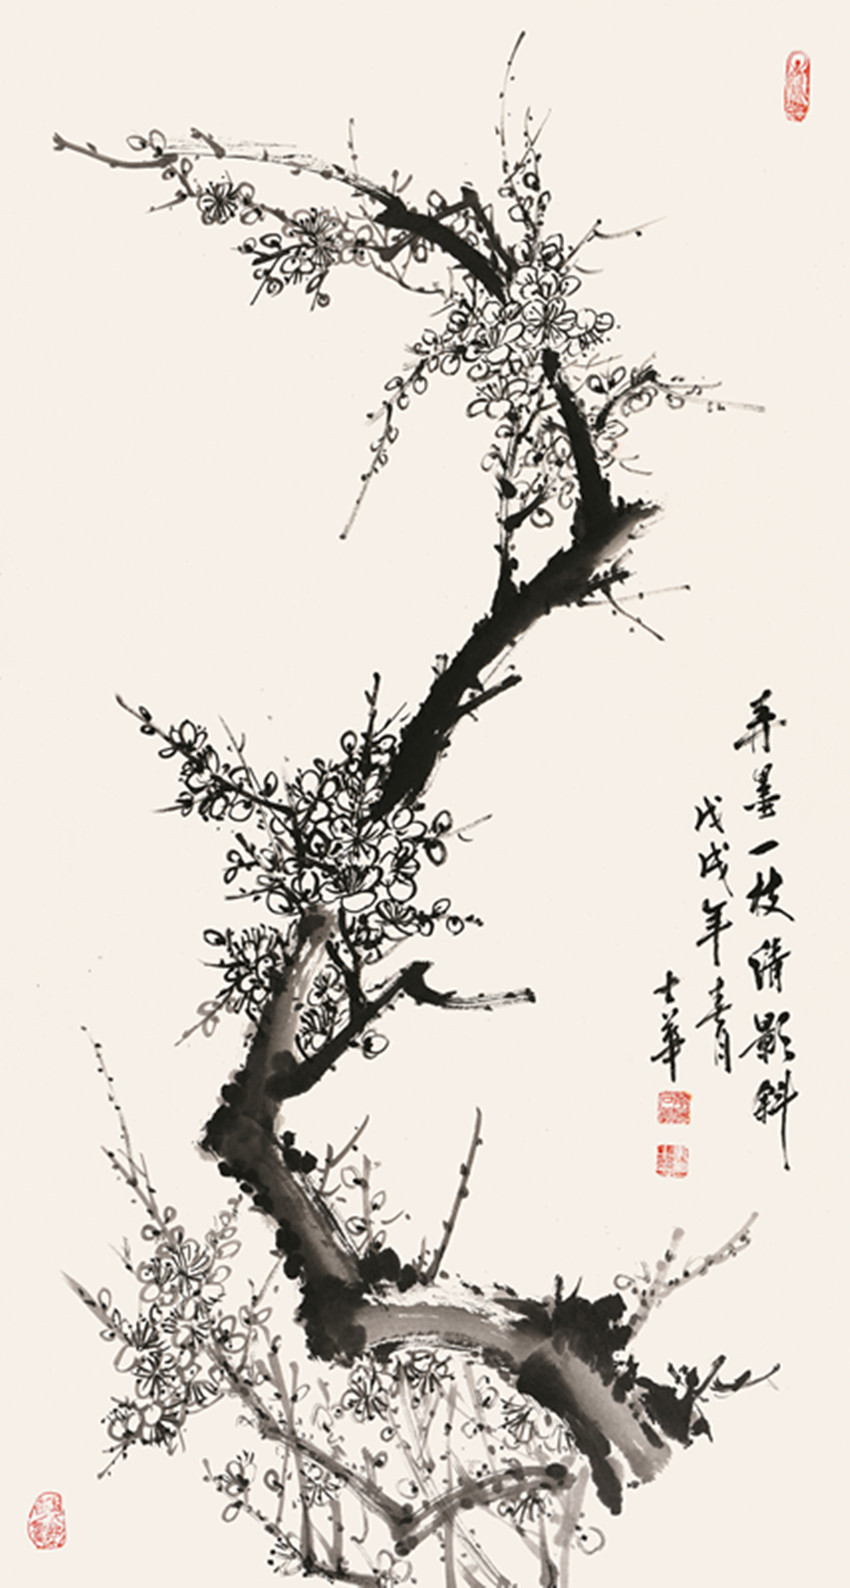 李士华/国画/梅兰竹菊